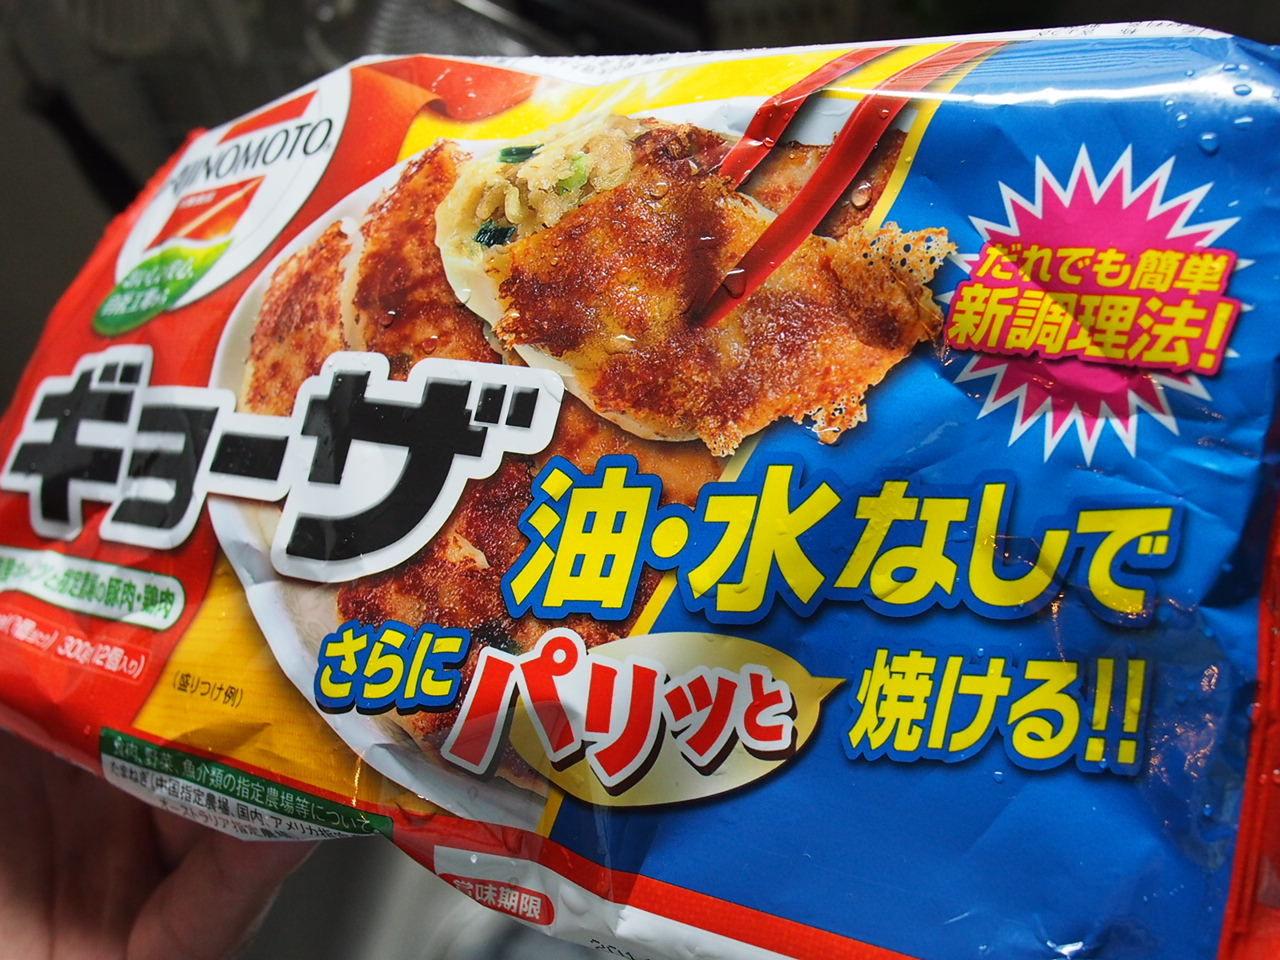 雑日記 : 味の素 冷凍餃子